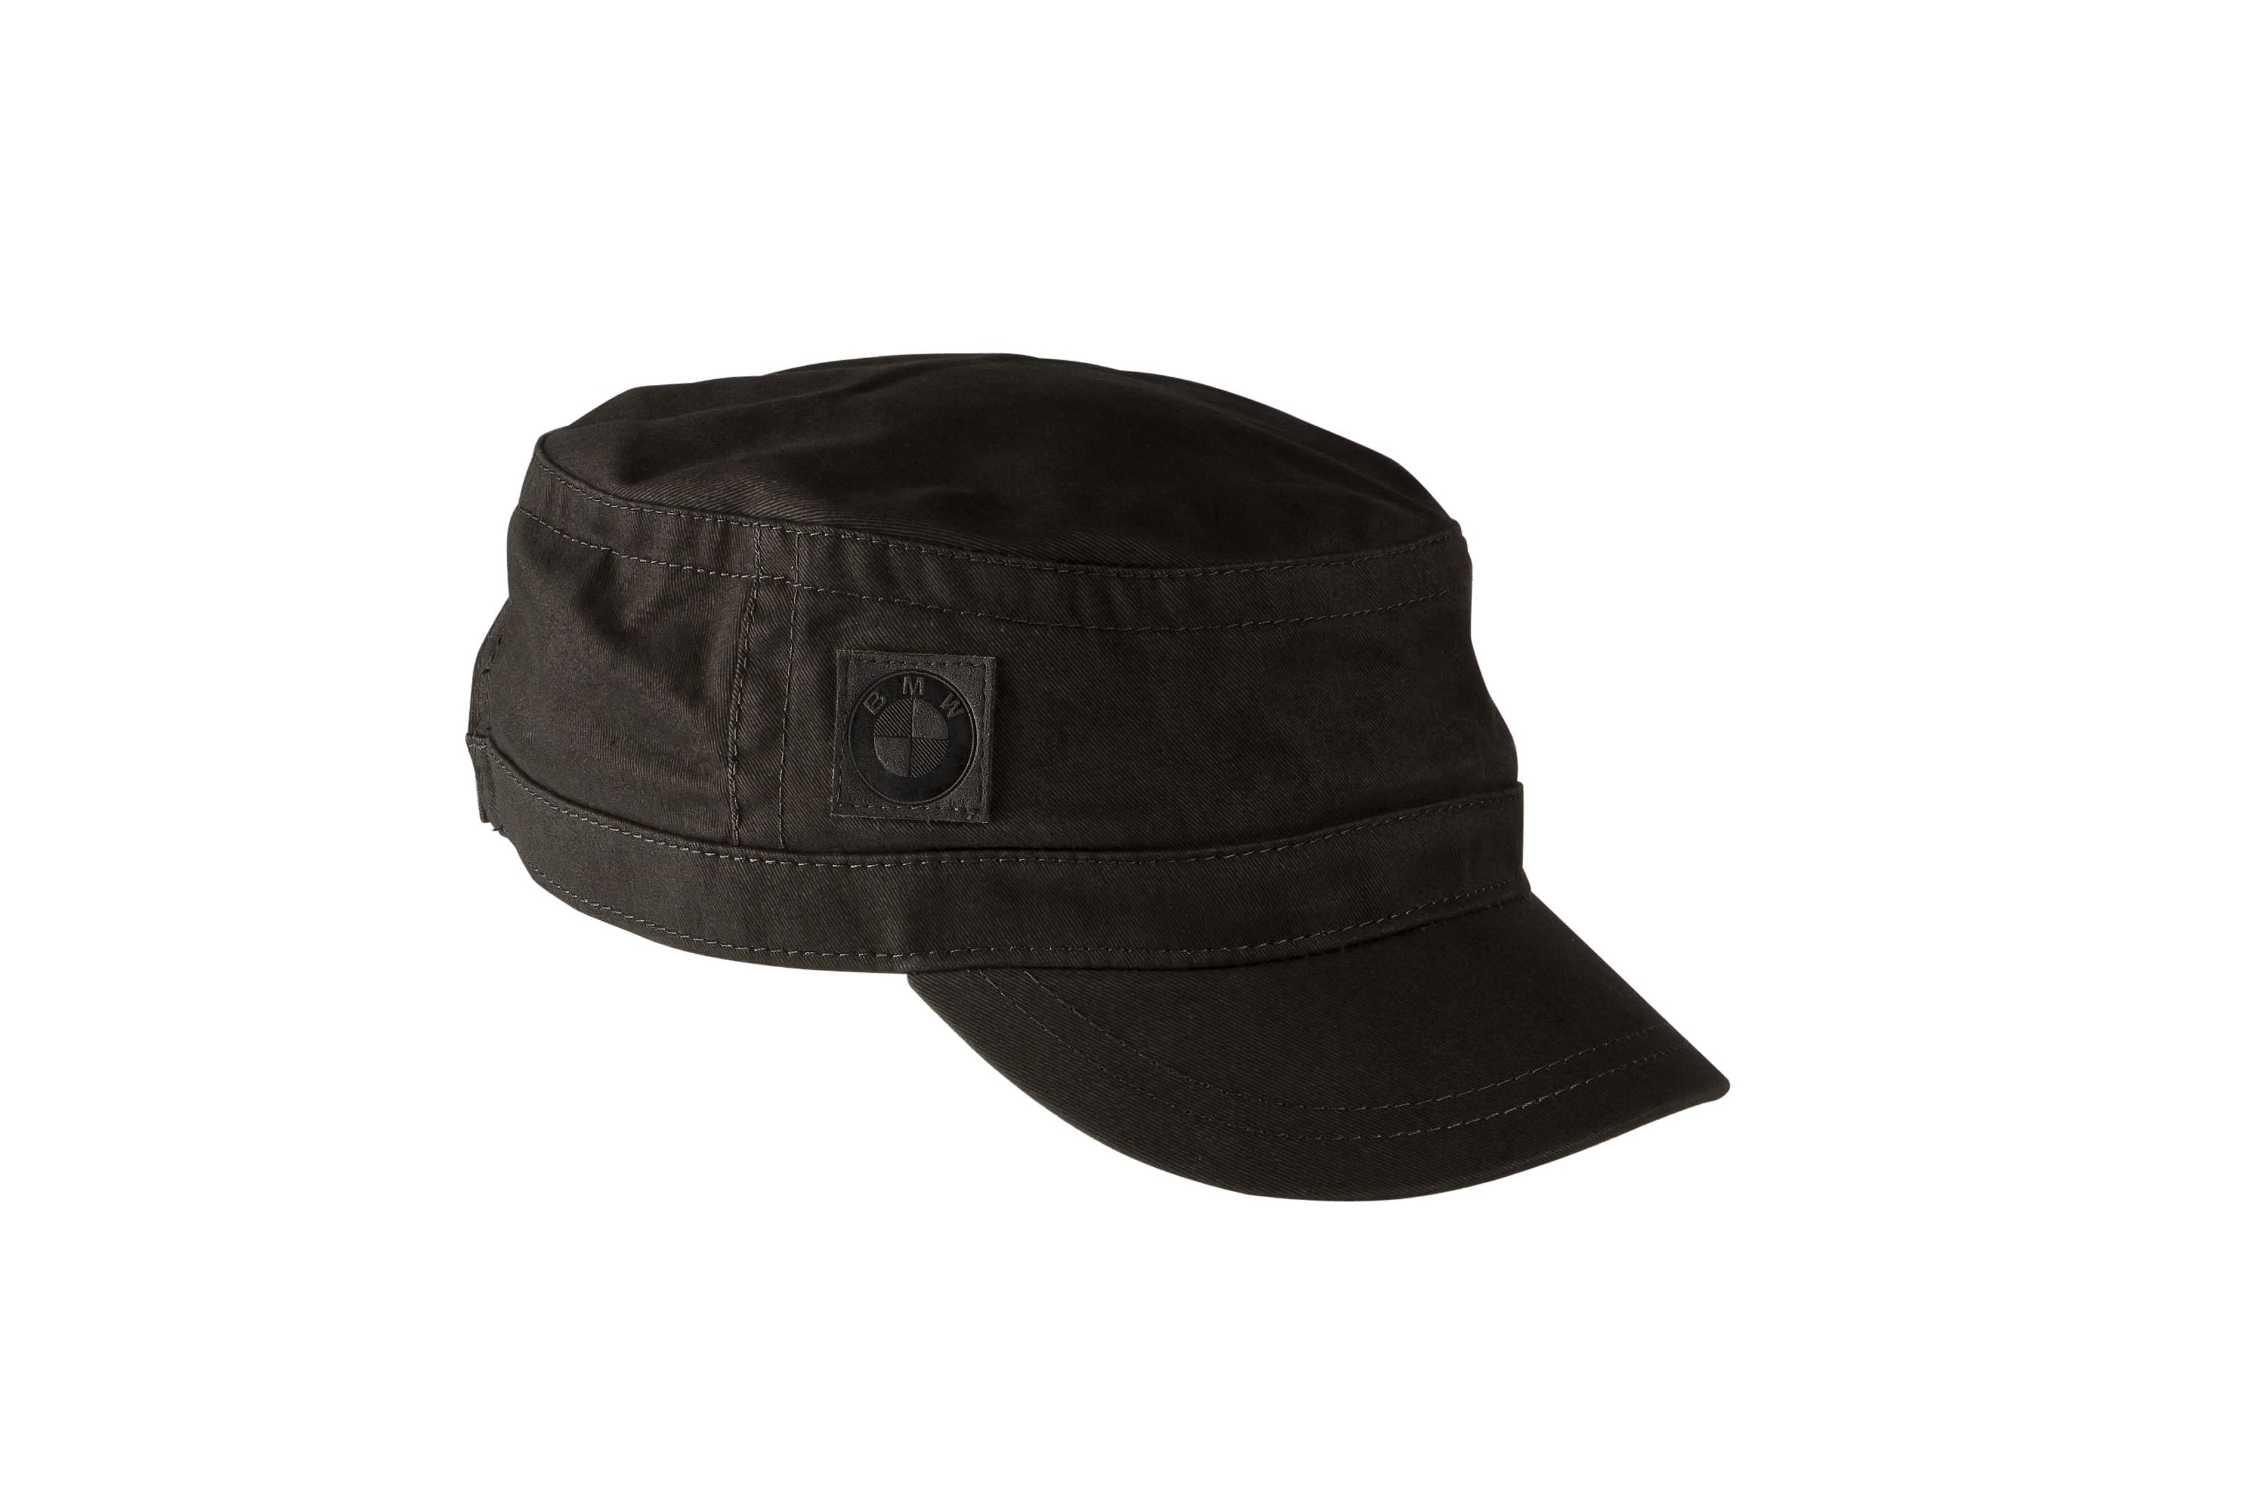 cap champion baseball bmw power official m wihte racing hat fan products unisex bwmw motorsport